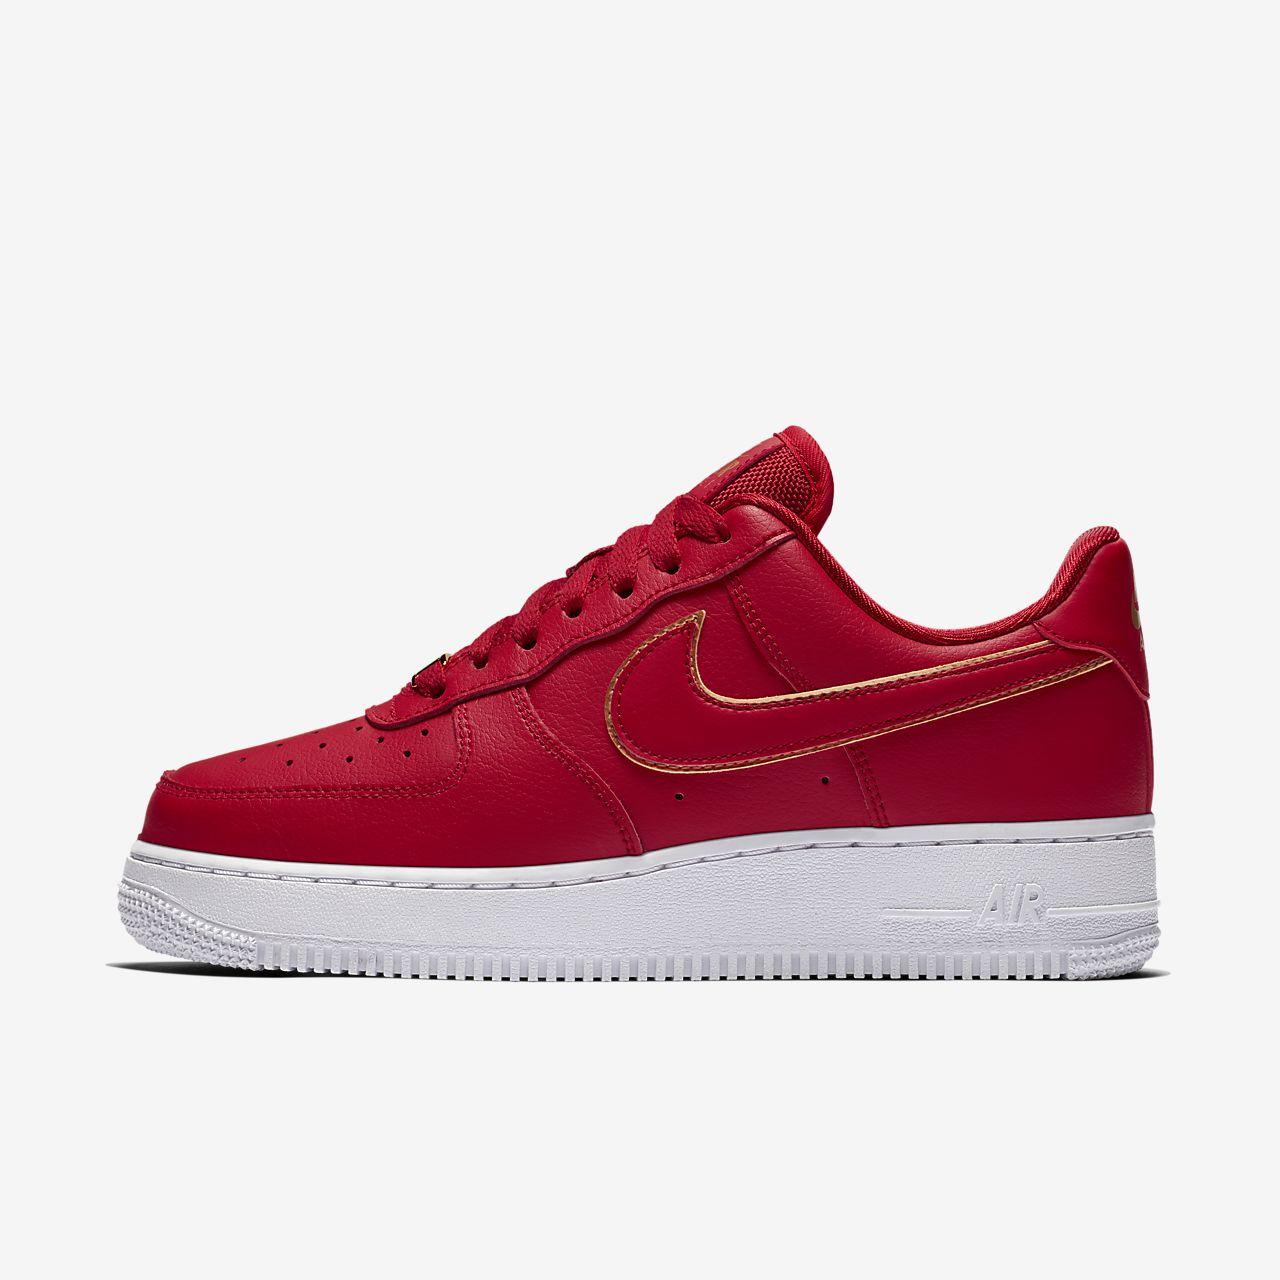 Nike Air Force 1 '07 ESS女子运动鞋